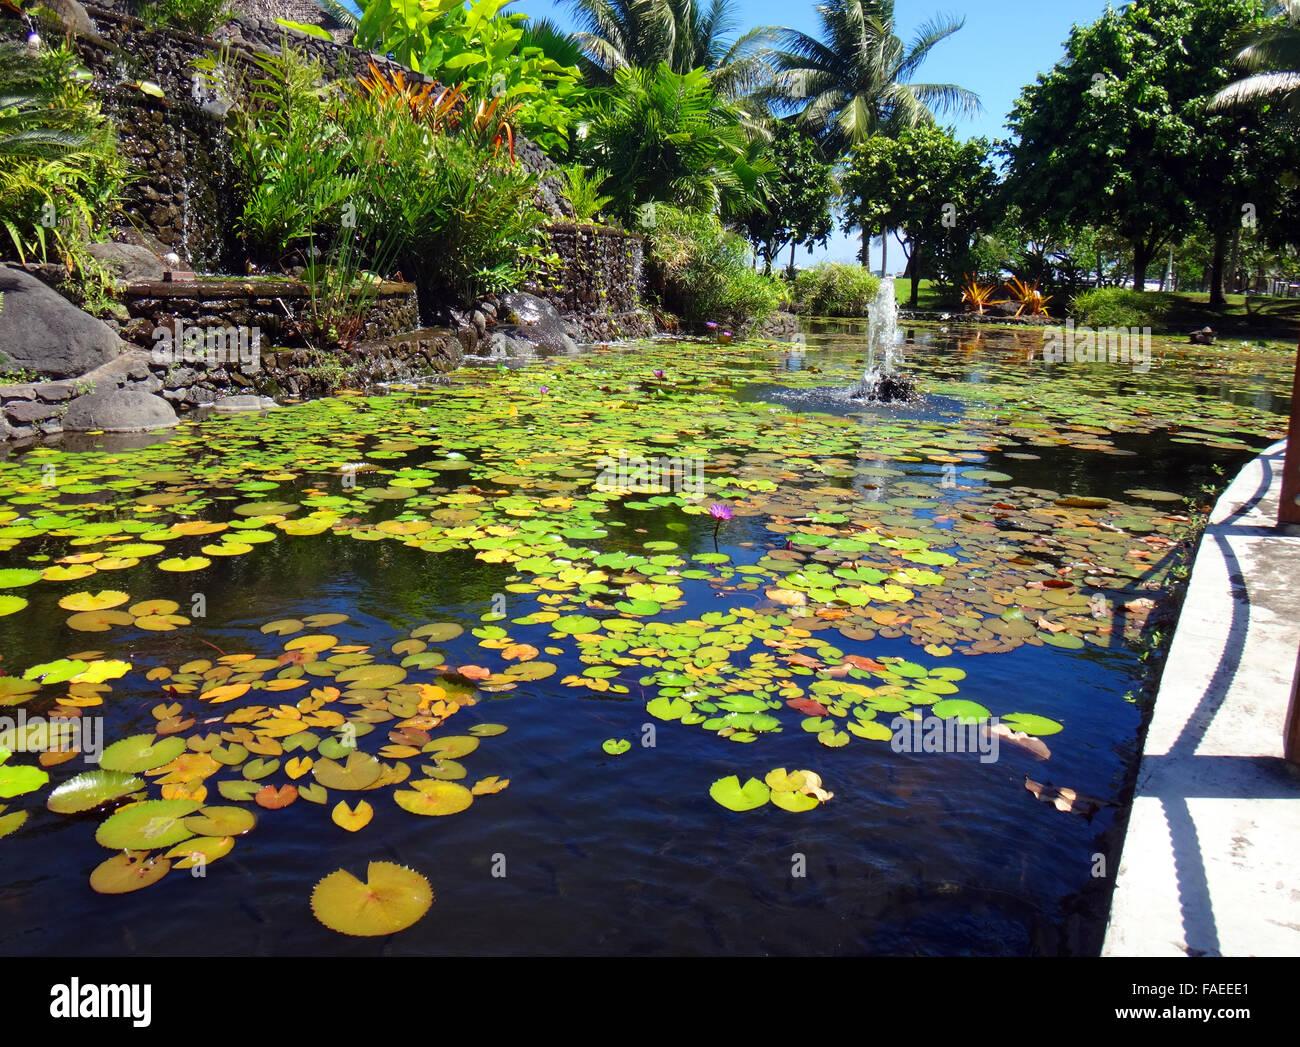 Ornamental fish pond of jardins de pa 39 ofa 39 i garden of for Ornamental pond fish inc